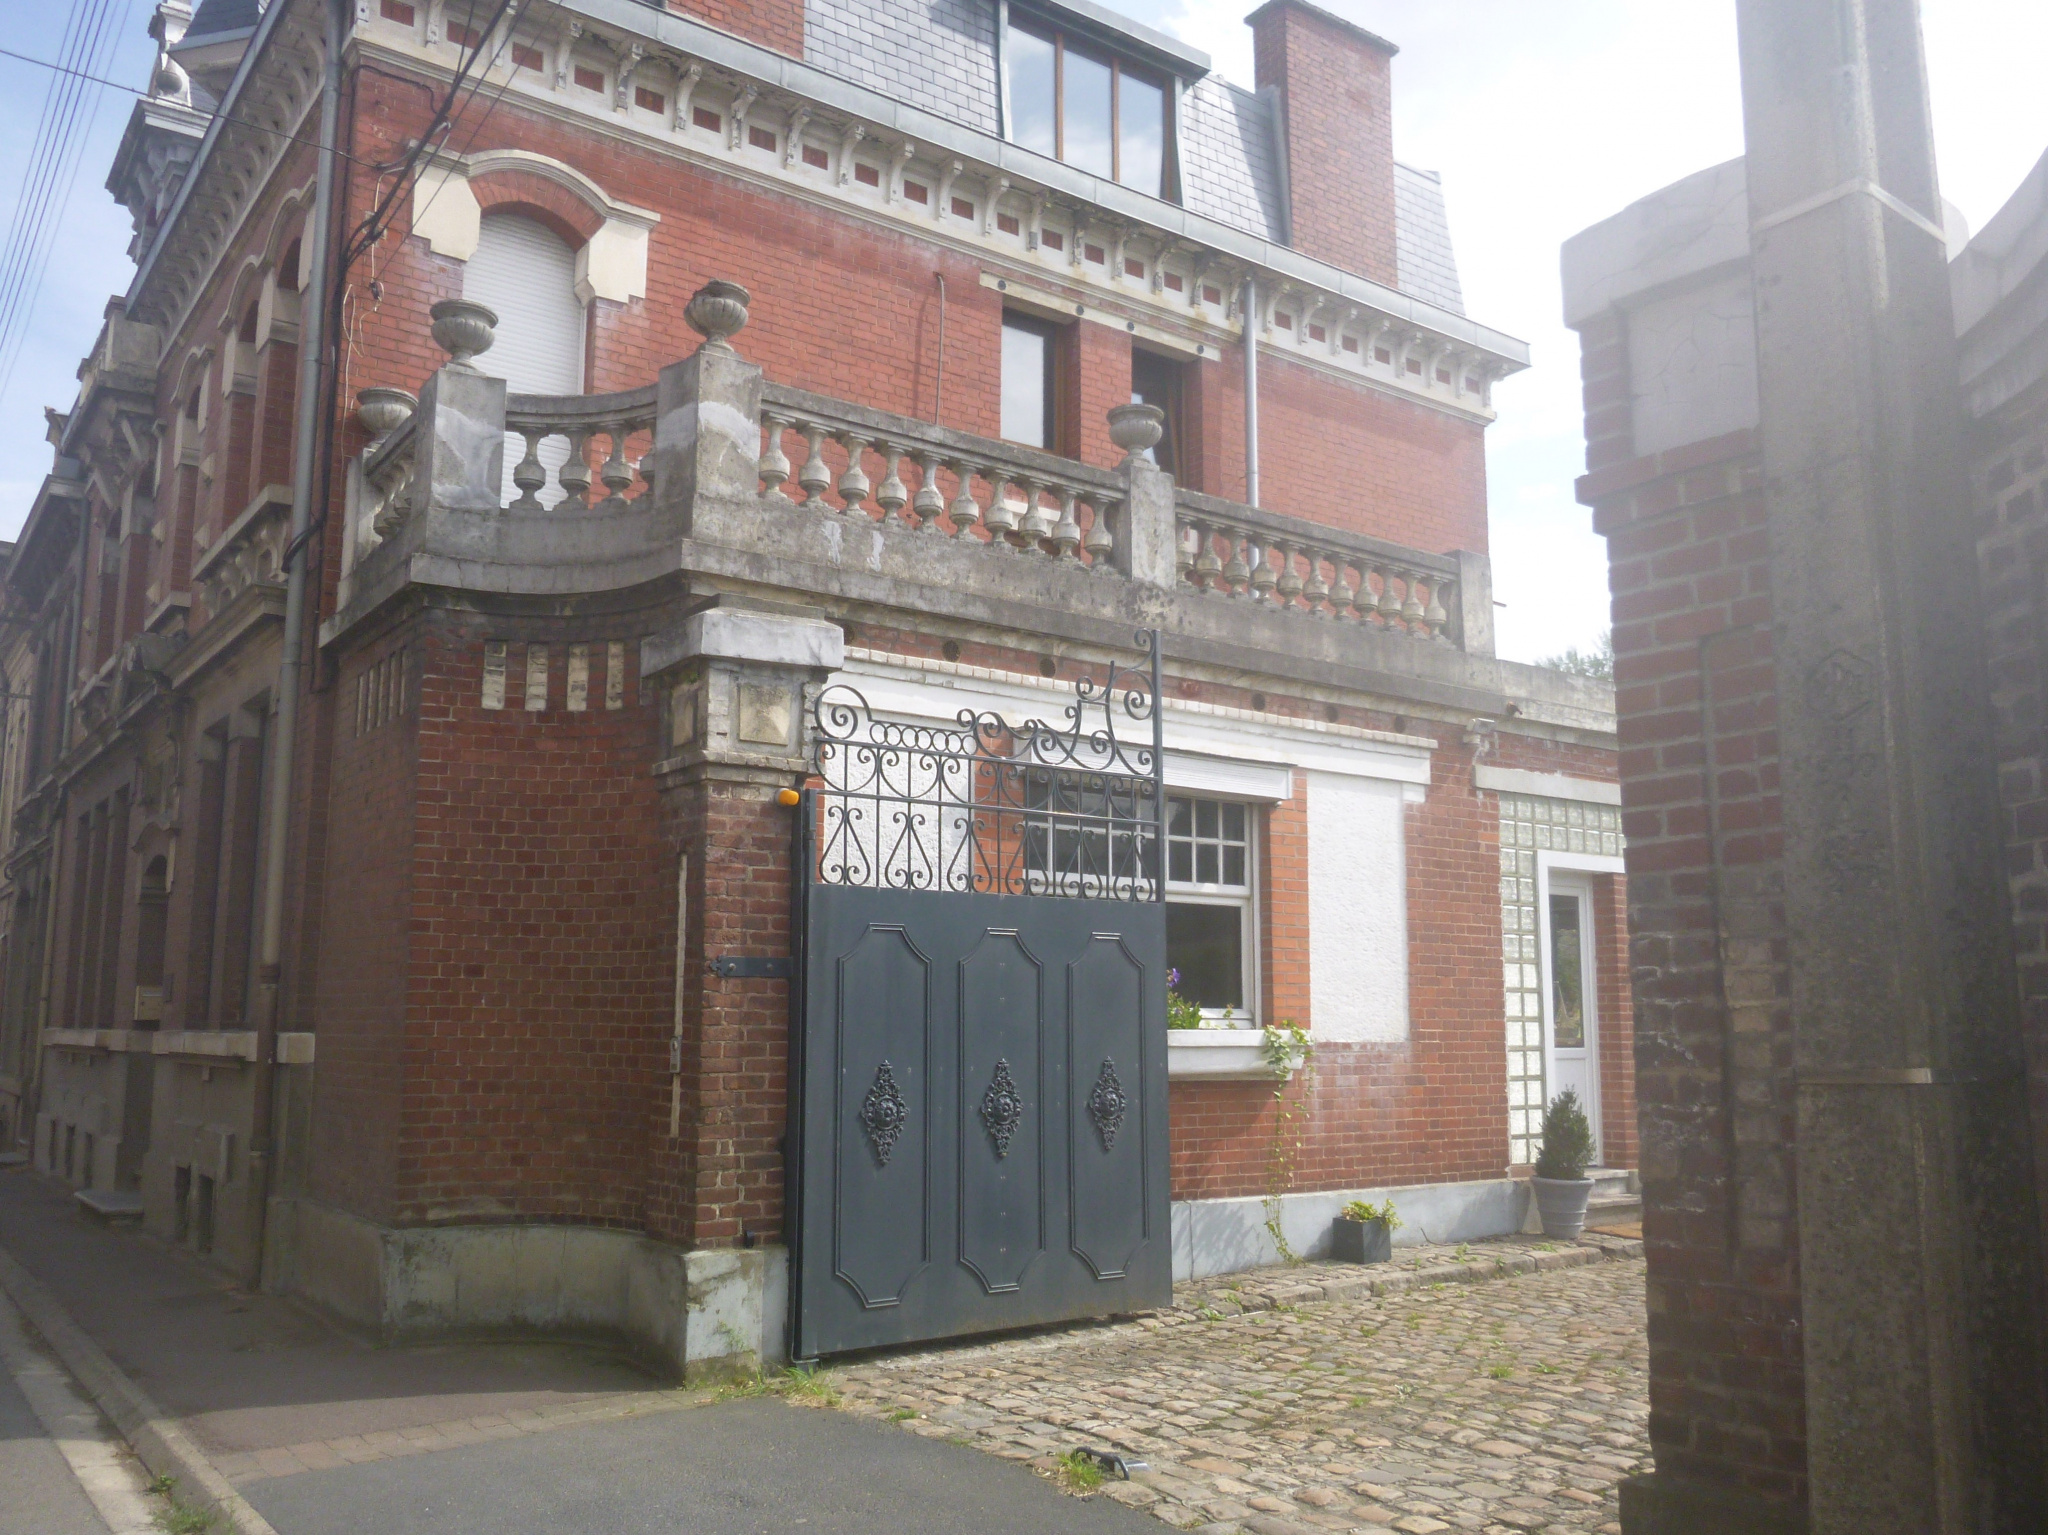 Maison Bourgeoise axe Cambrai Valenciennes 320m²   281000€ FAI   ANNIE CAILLIER Tél 0683162981